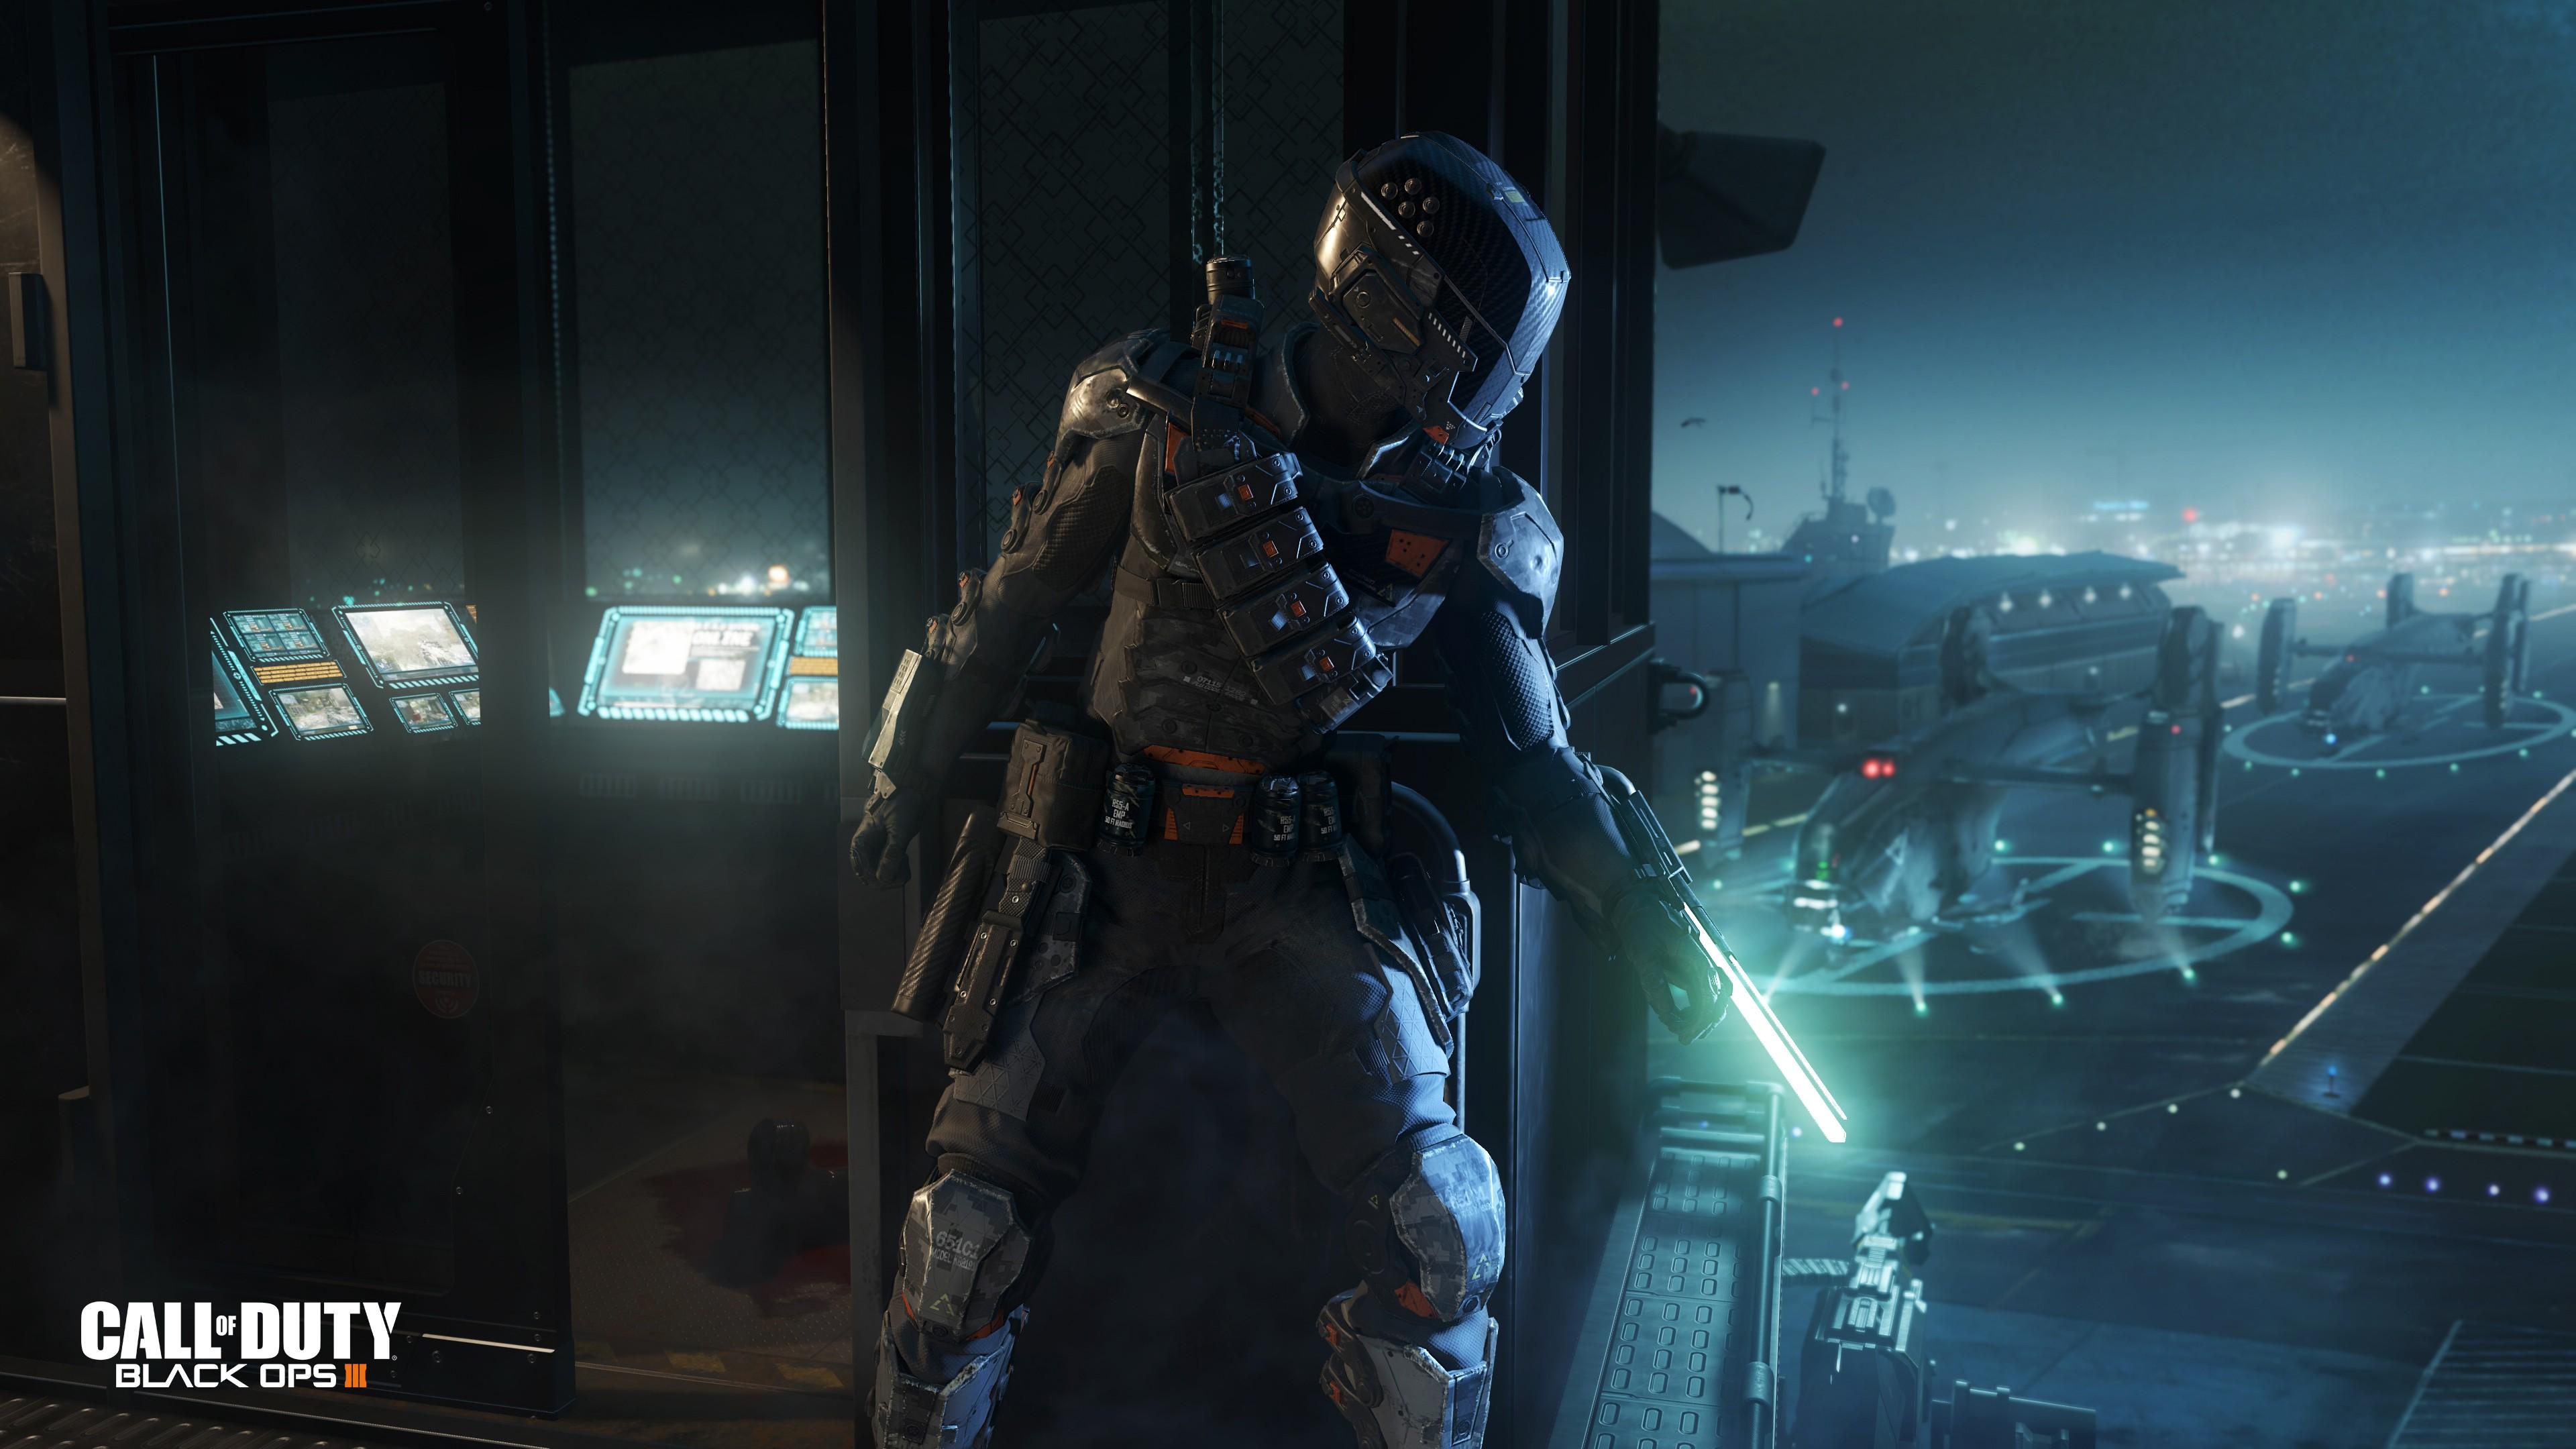 Wallpaper Call of Duty: Black Ops 3, Best Games, sci-fi